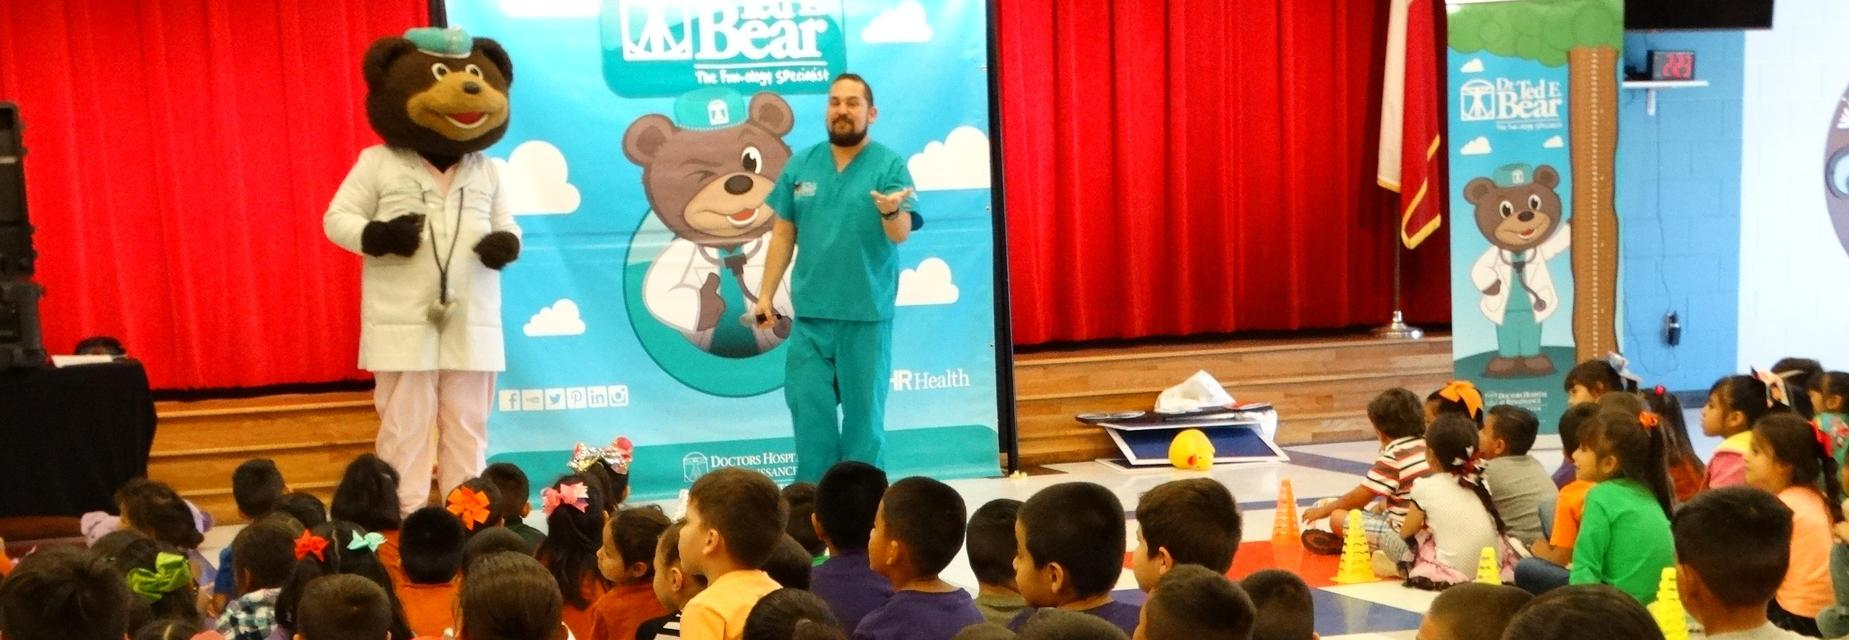 DHR presentation during Red Ribbon Week